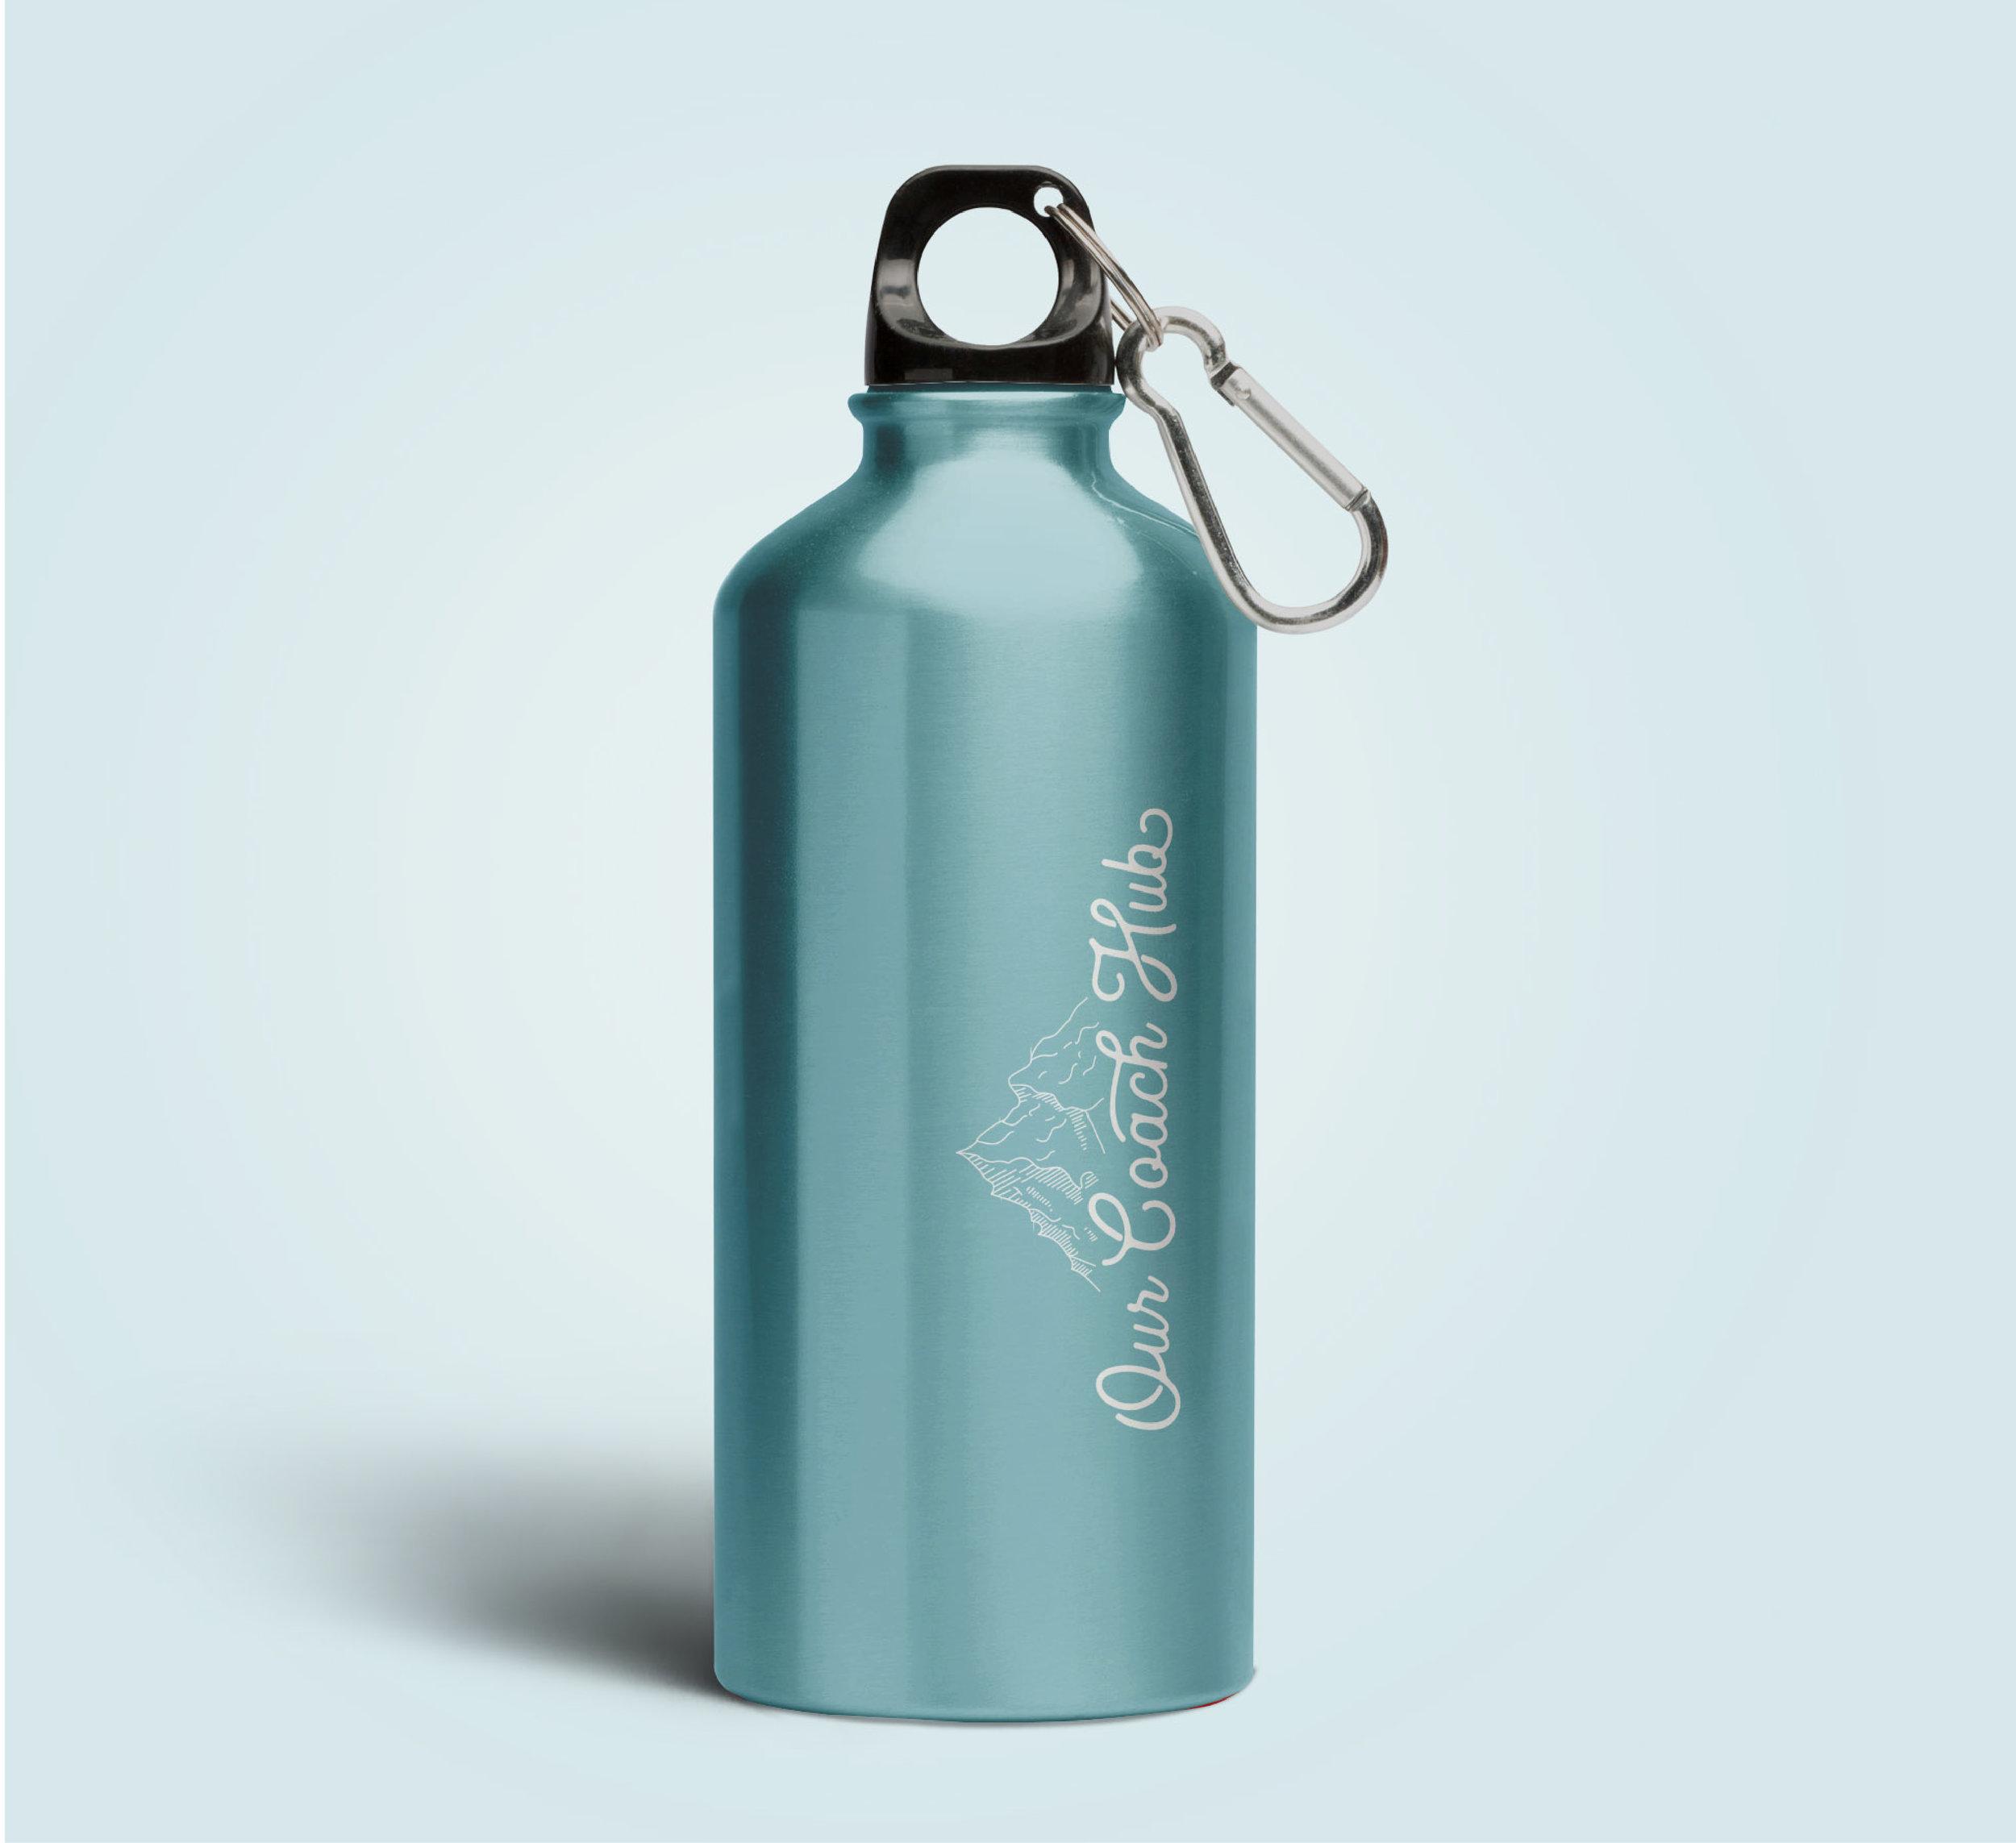 och bottle-14.jpg